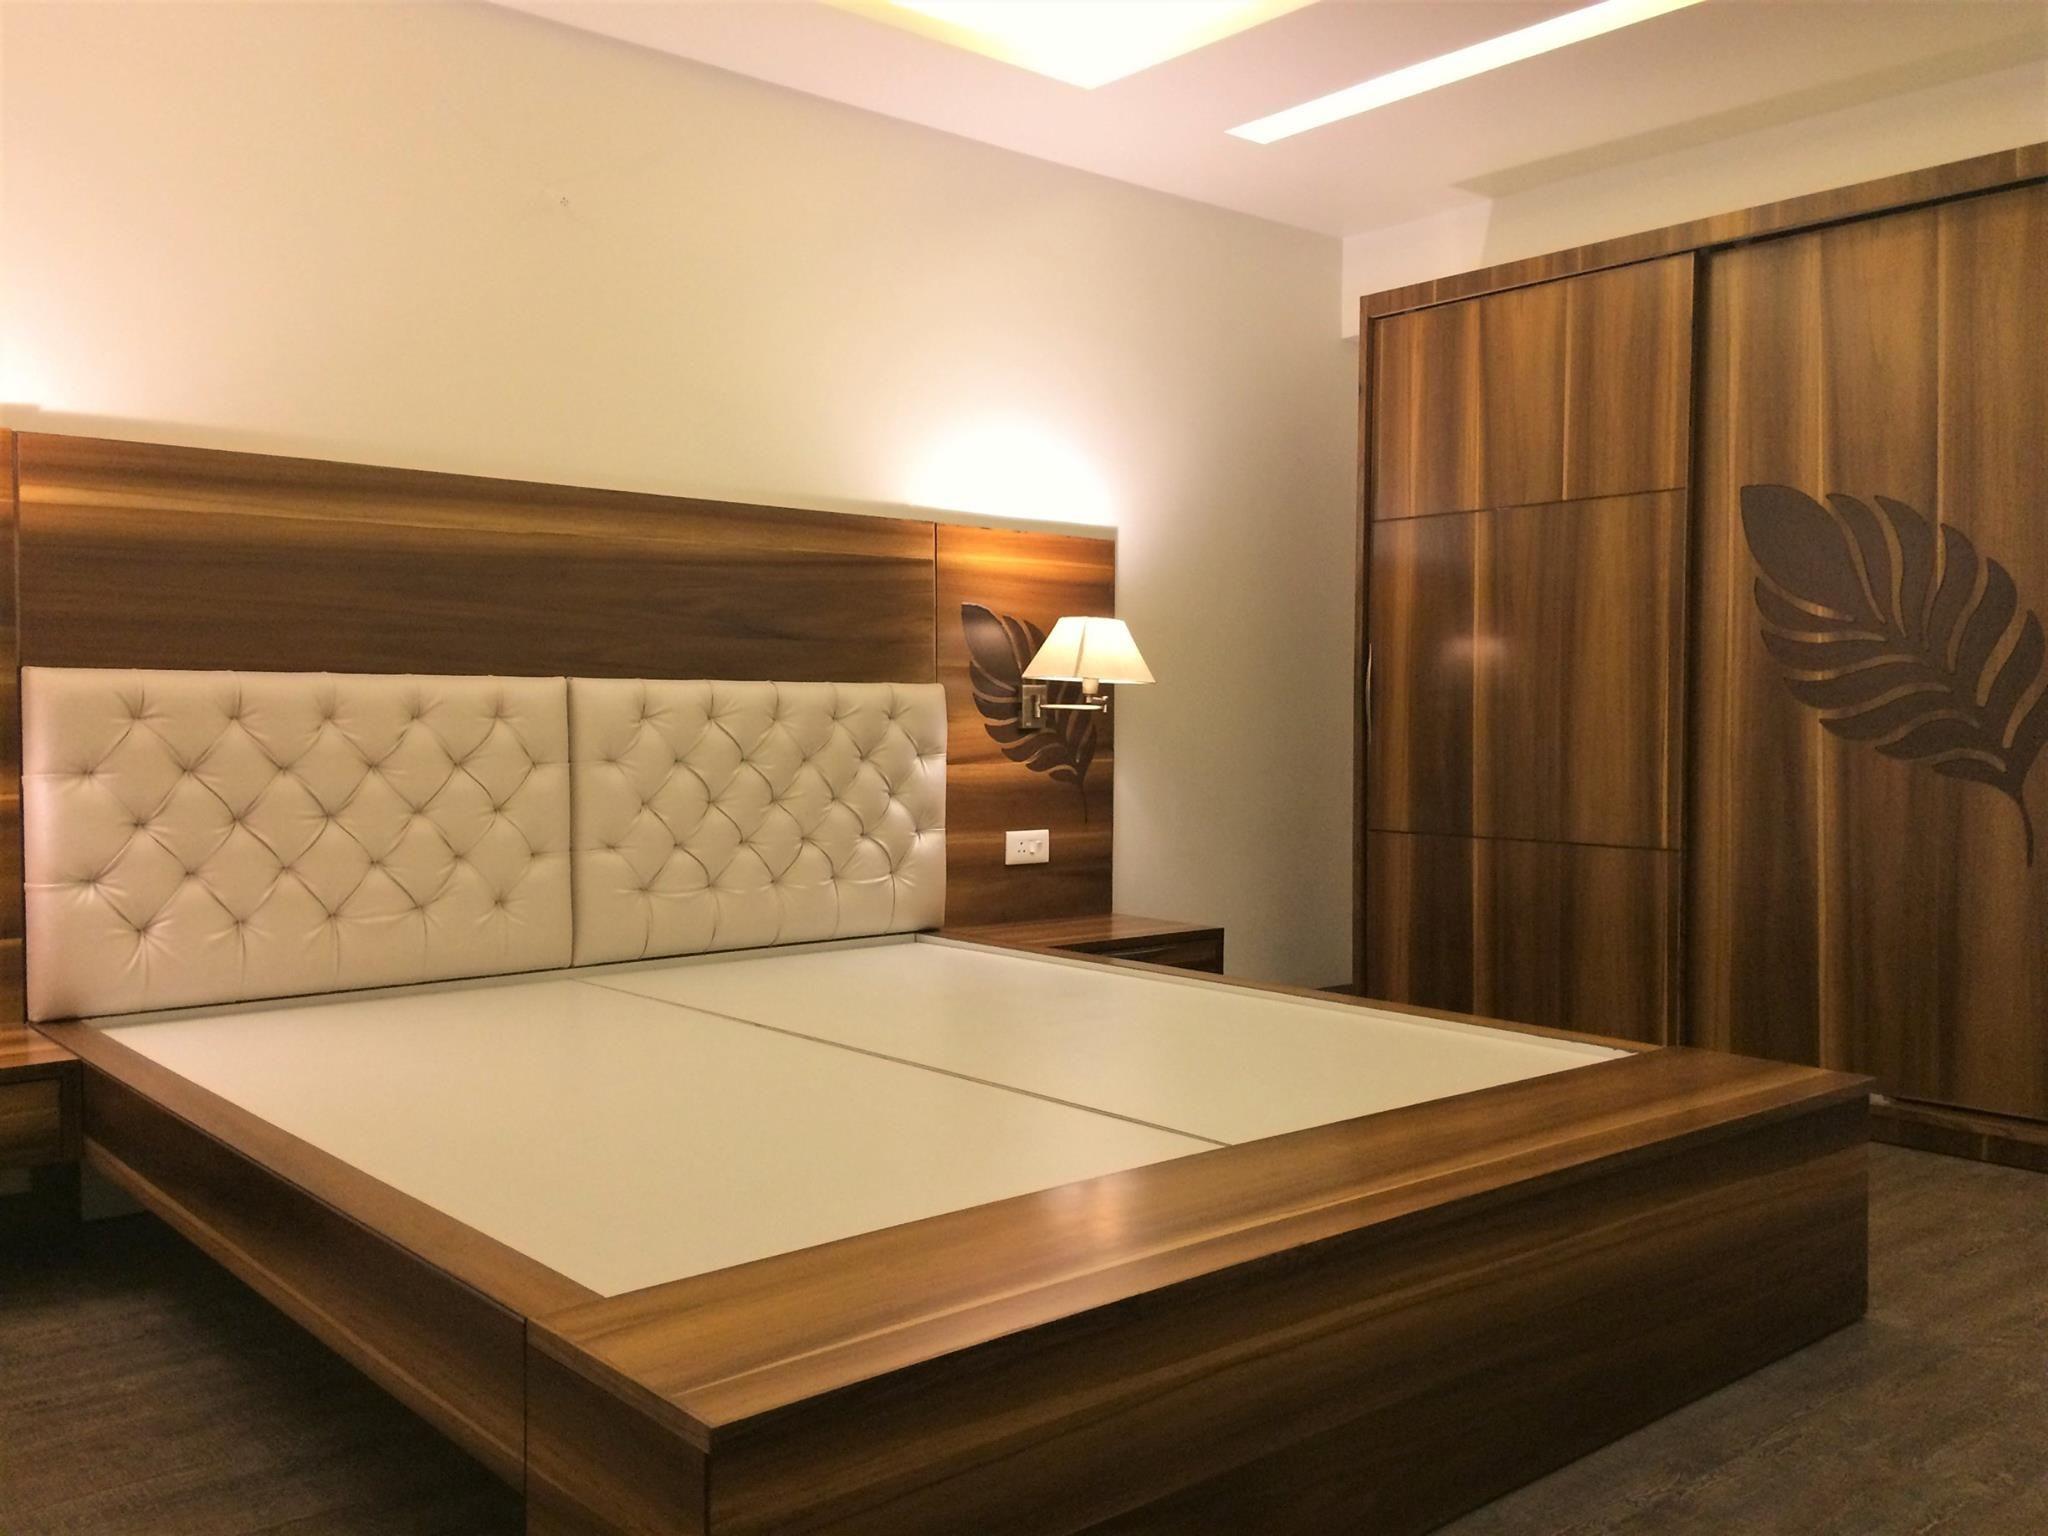 200 Bedroom Designs With Images Bed Furniture Design